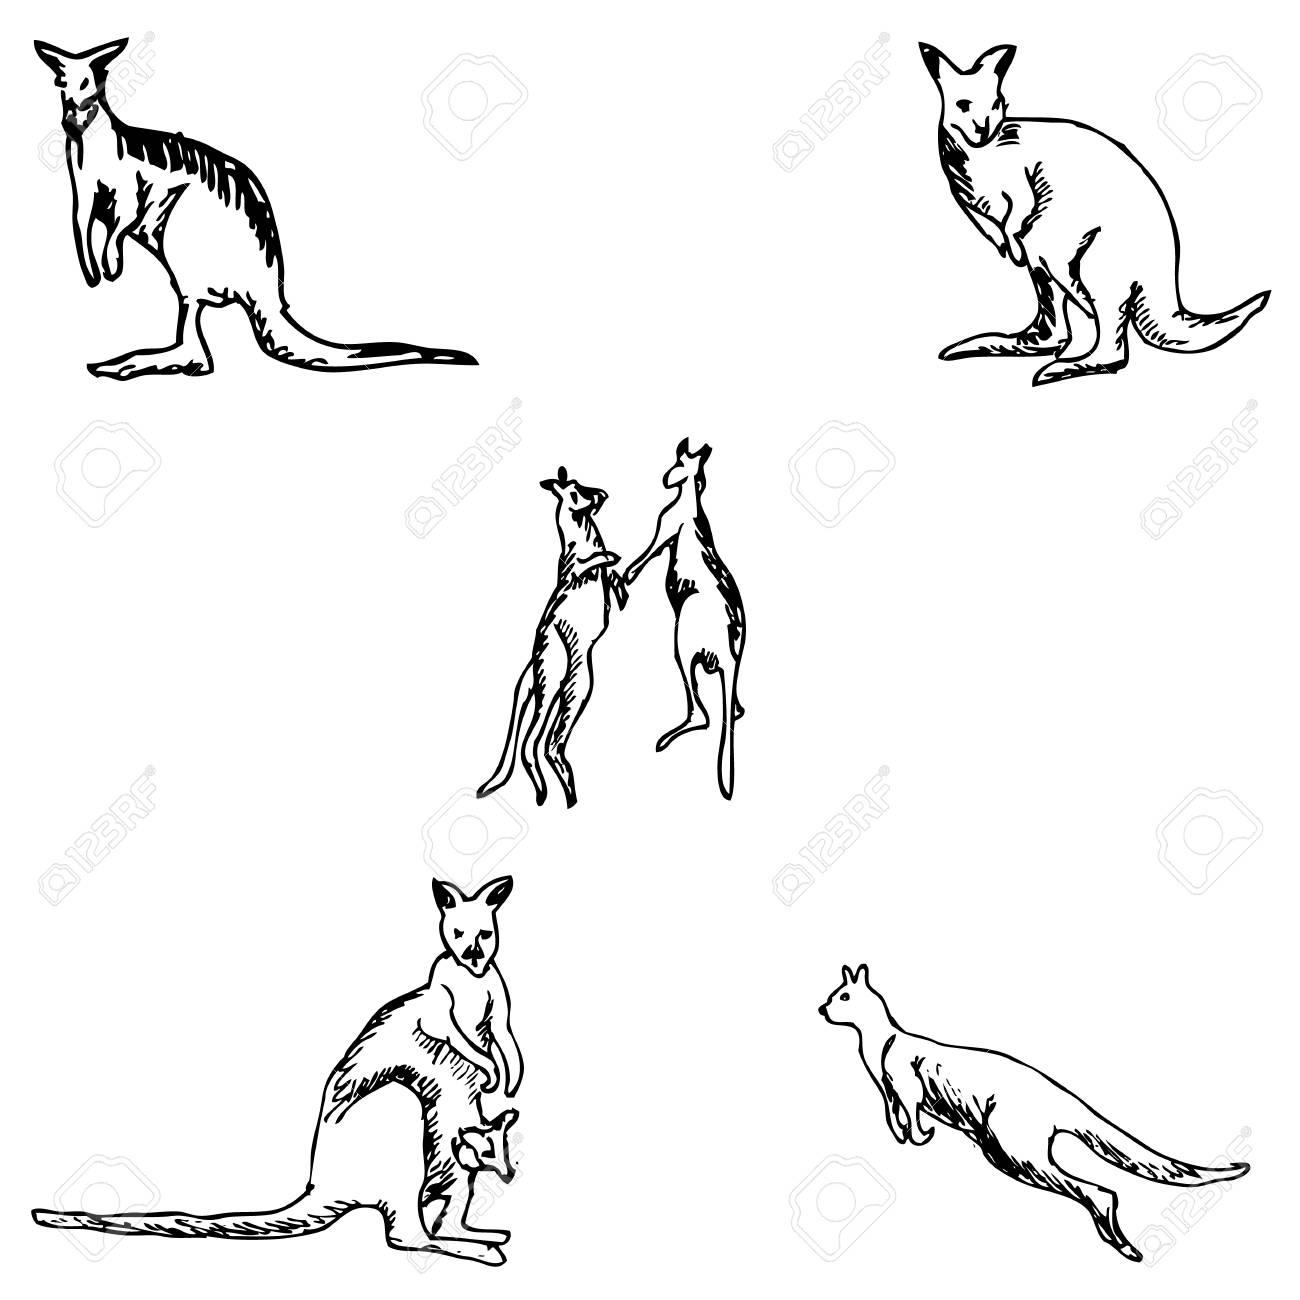 1300x1300 Kangaroo. A Sketch By Hand. Pencil Drawing. Vector Image Royalty